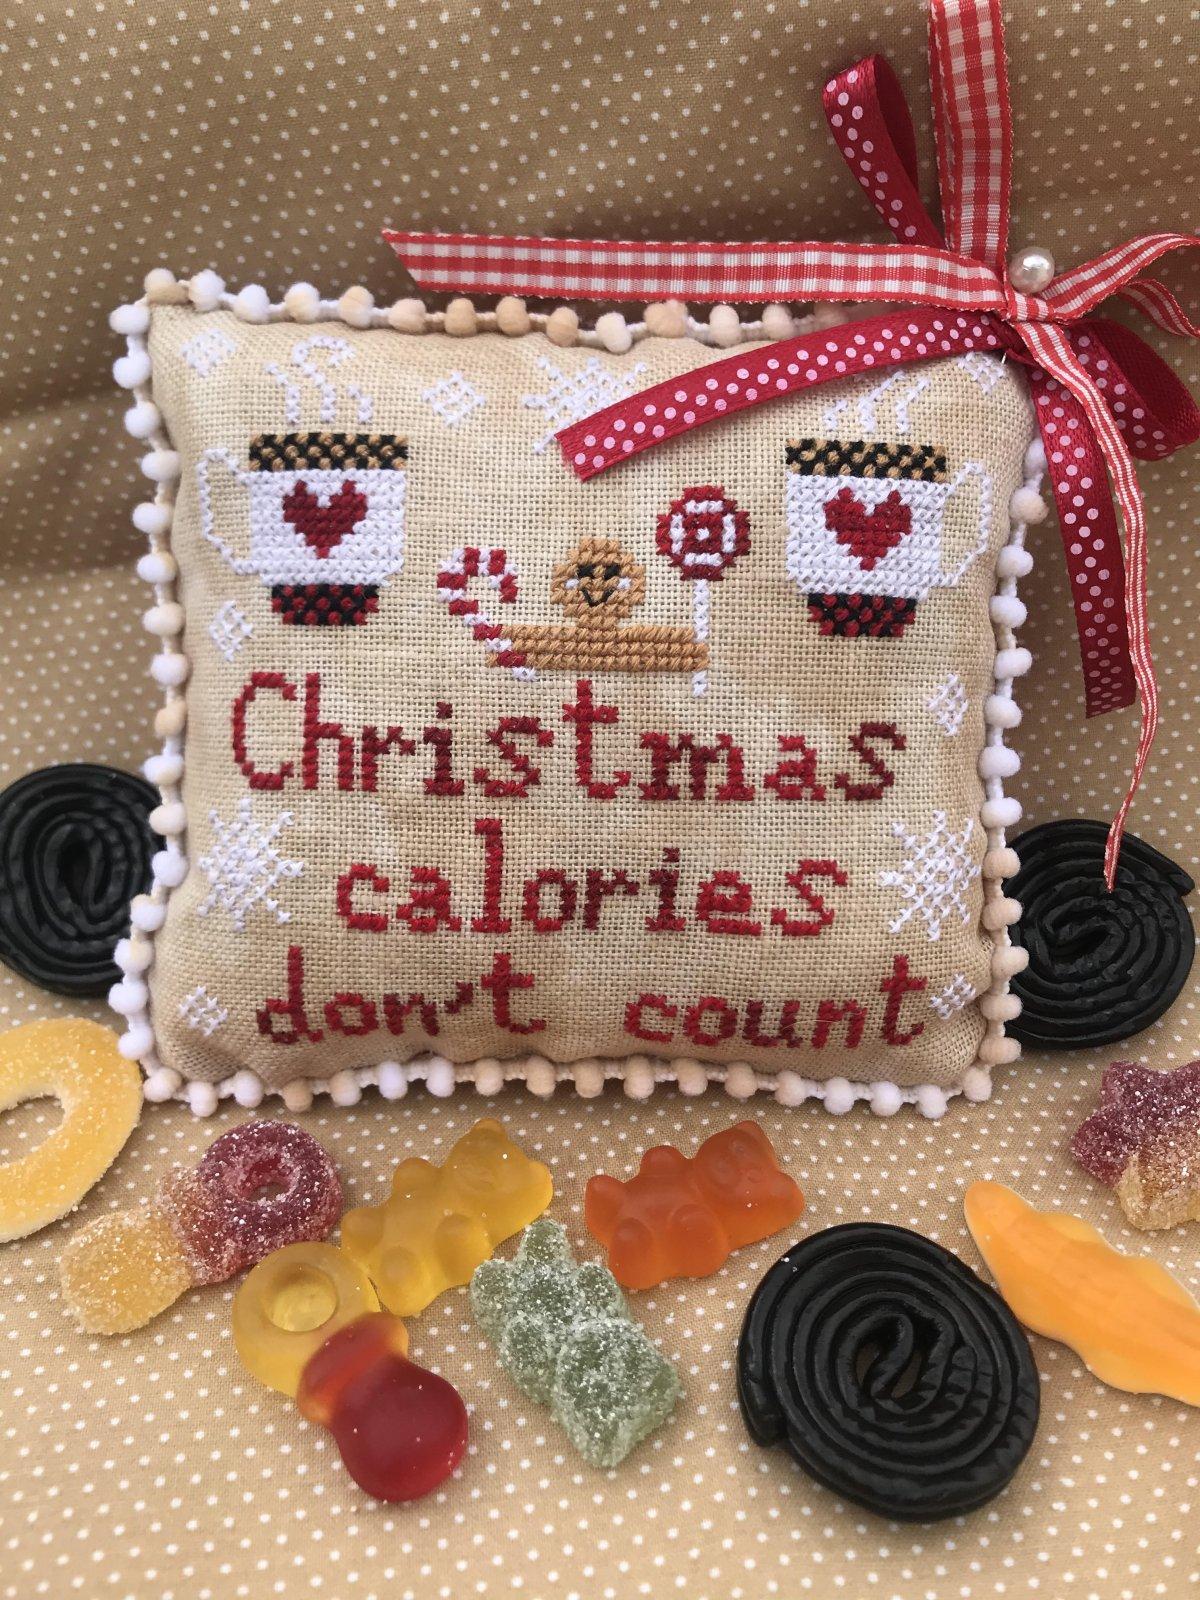 Christmas Calories chart - Romy's Creations